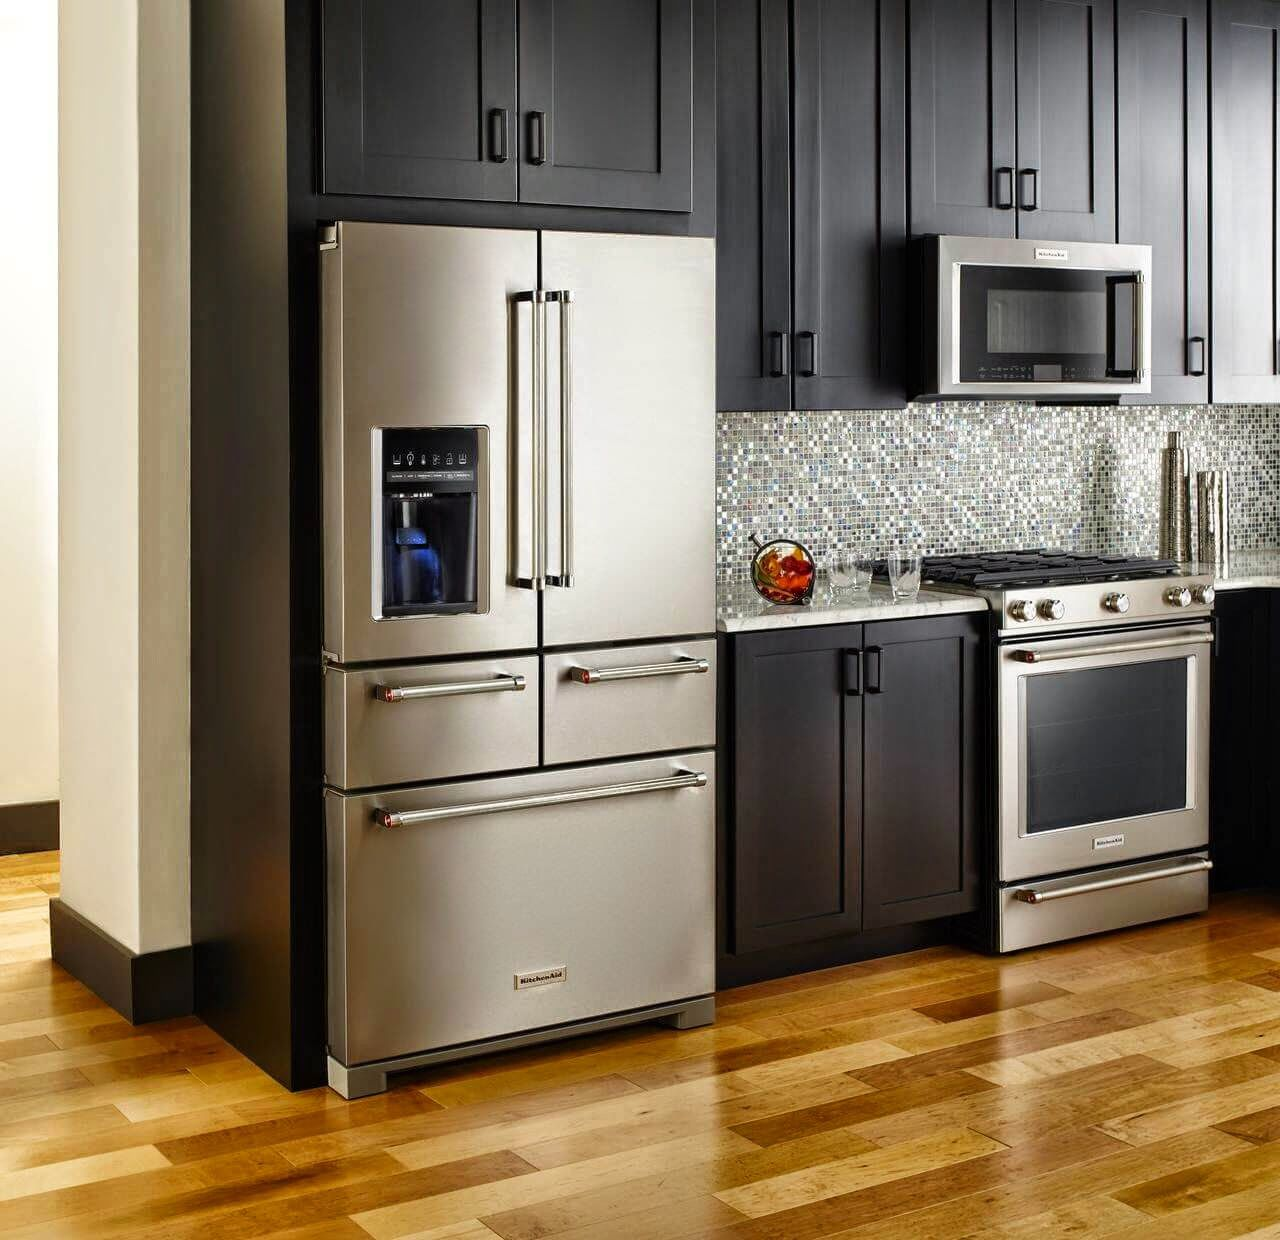 Kitchen aid appliances.. | Kitchen aid appliances, Kitchen ...